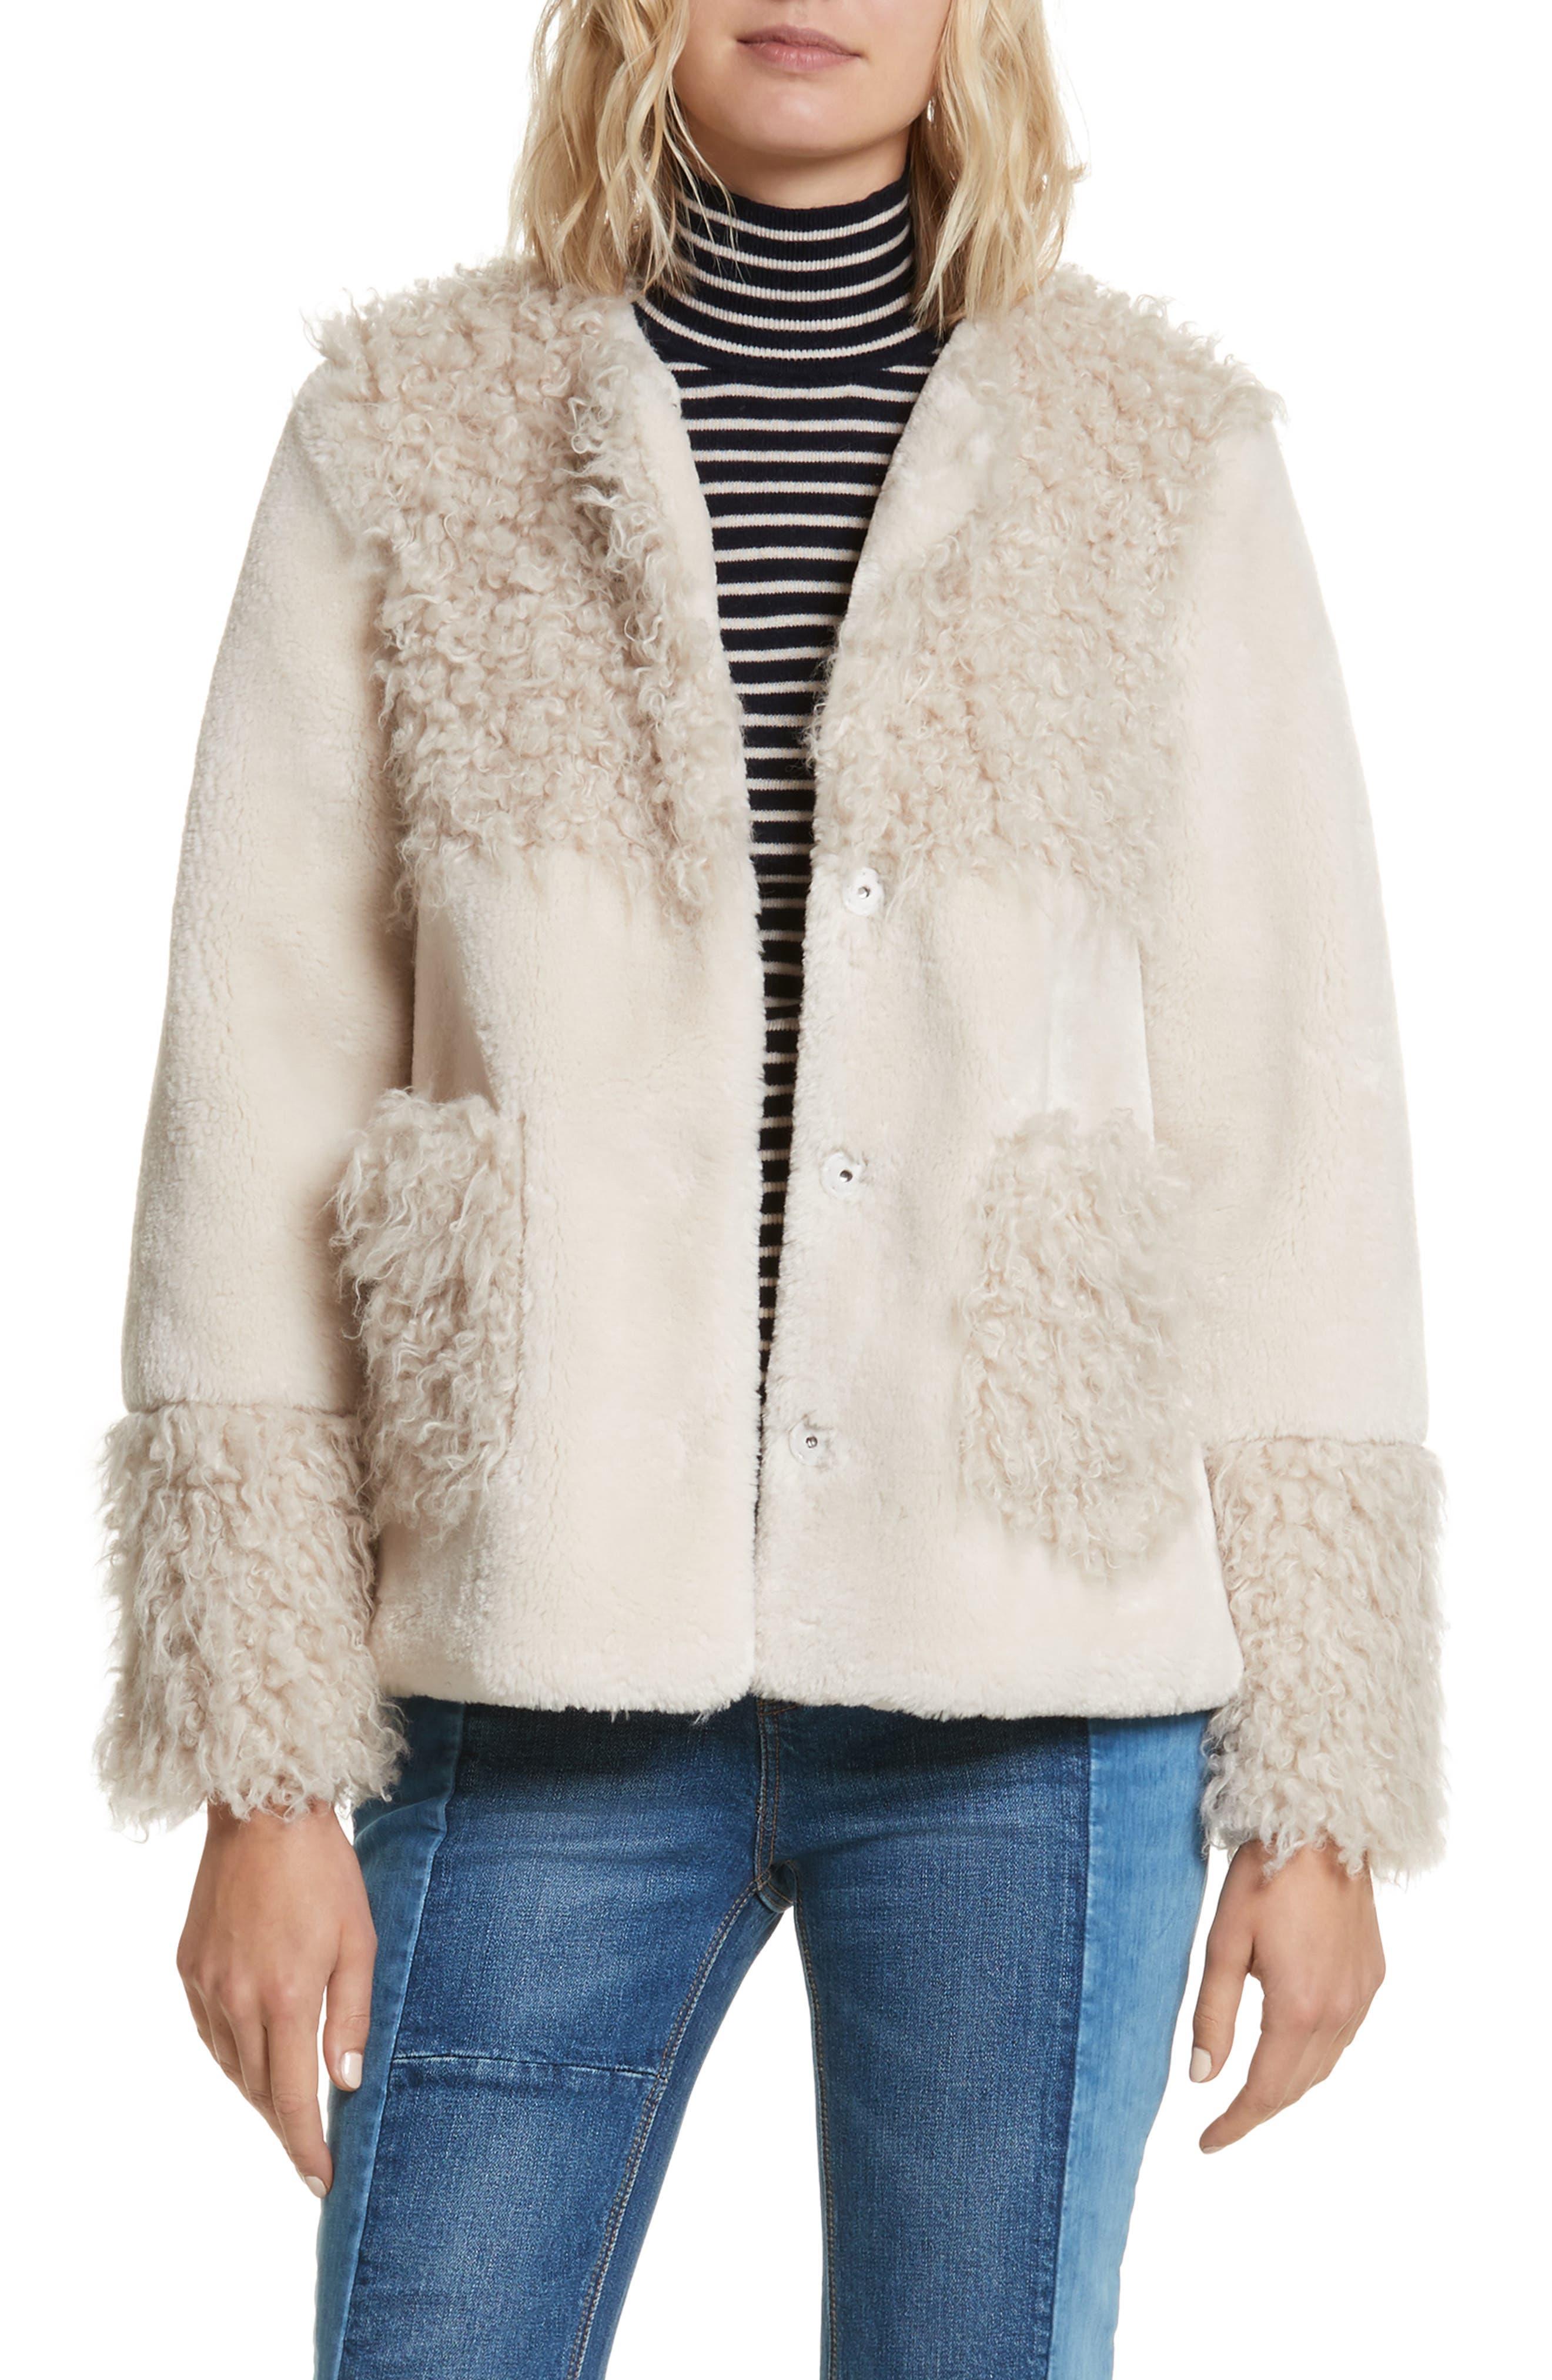 Main Image - La Vie Rebecca Taylor Mixed Faux Fur Coat